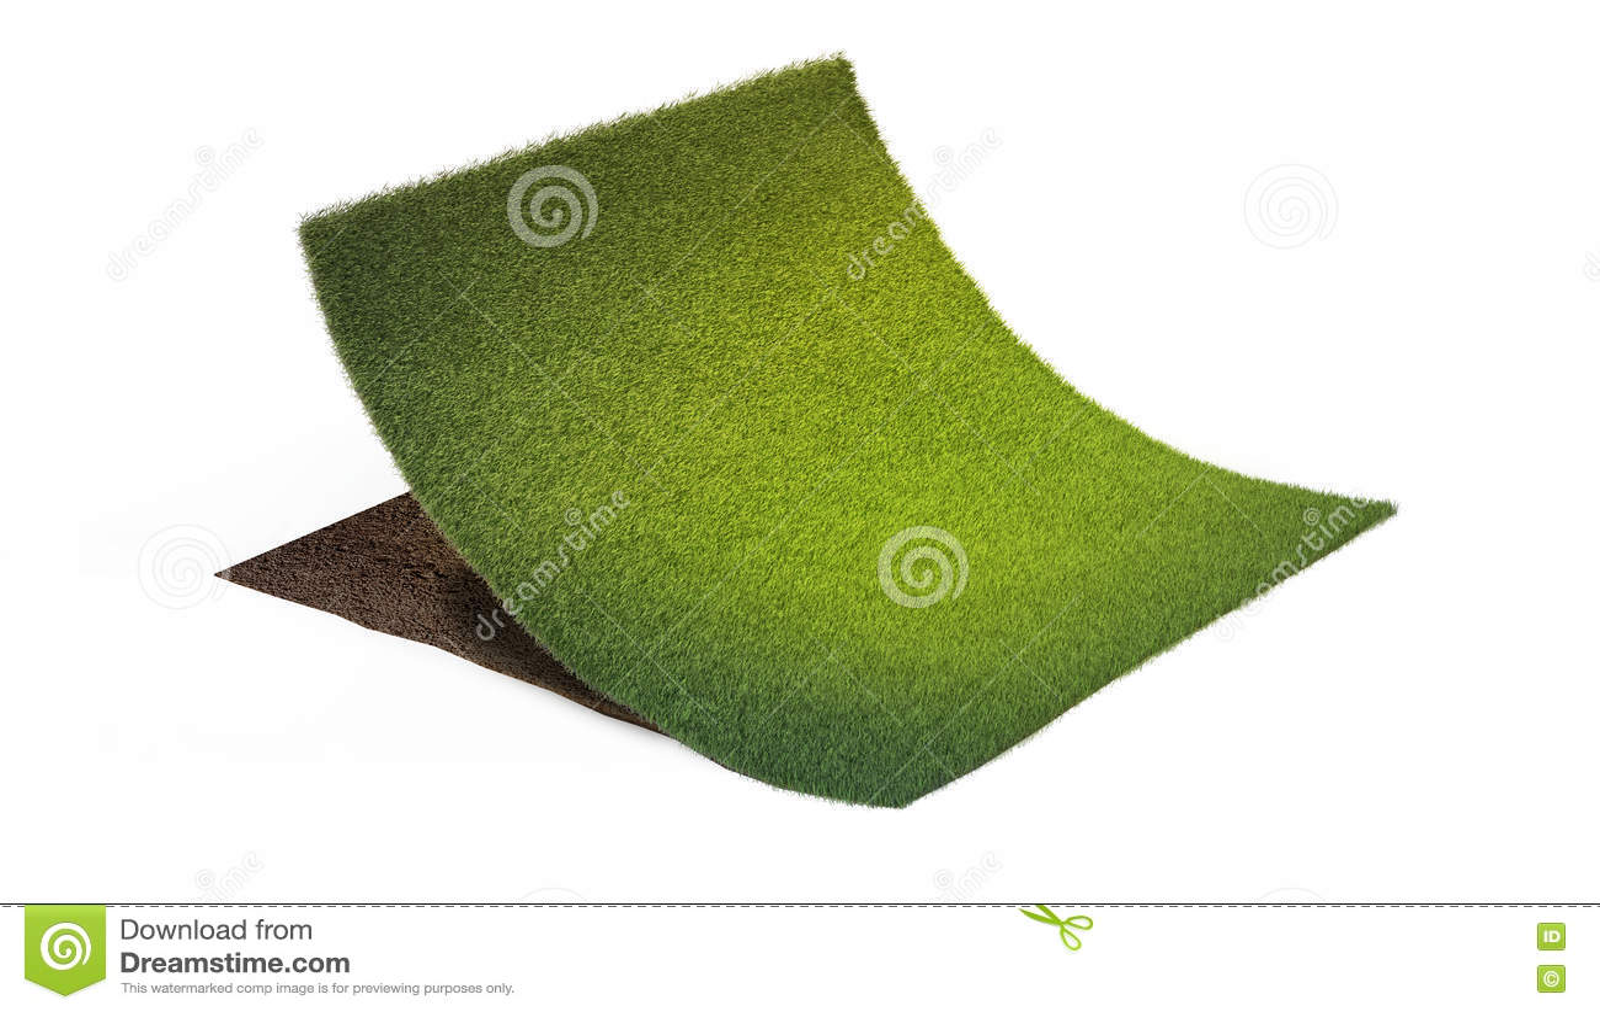 Fußboden Querschnitt ~ Querschnitt boden mit teil rasen stockbild bild von unter land